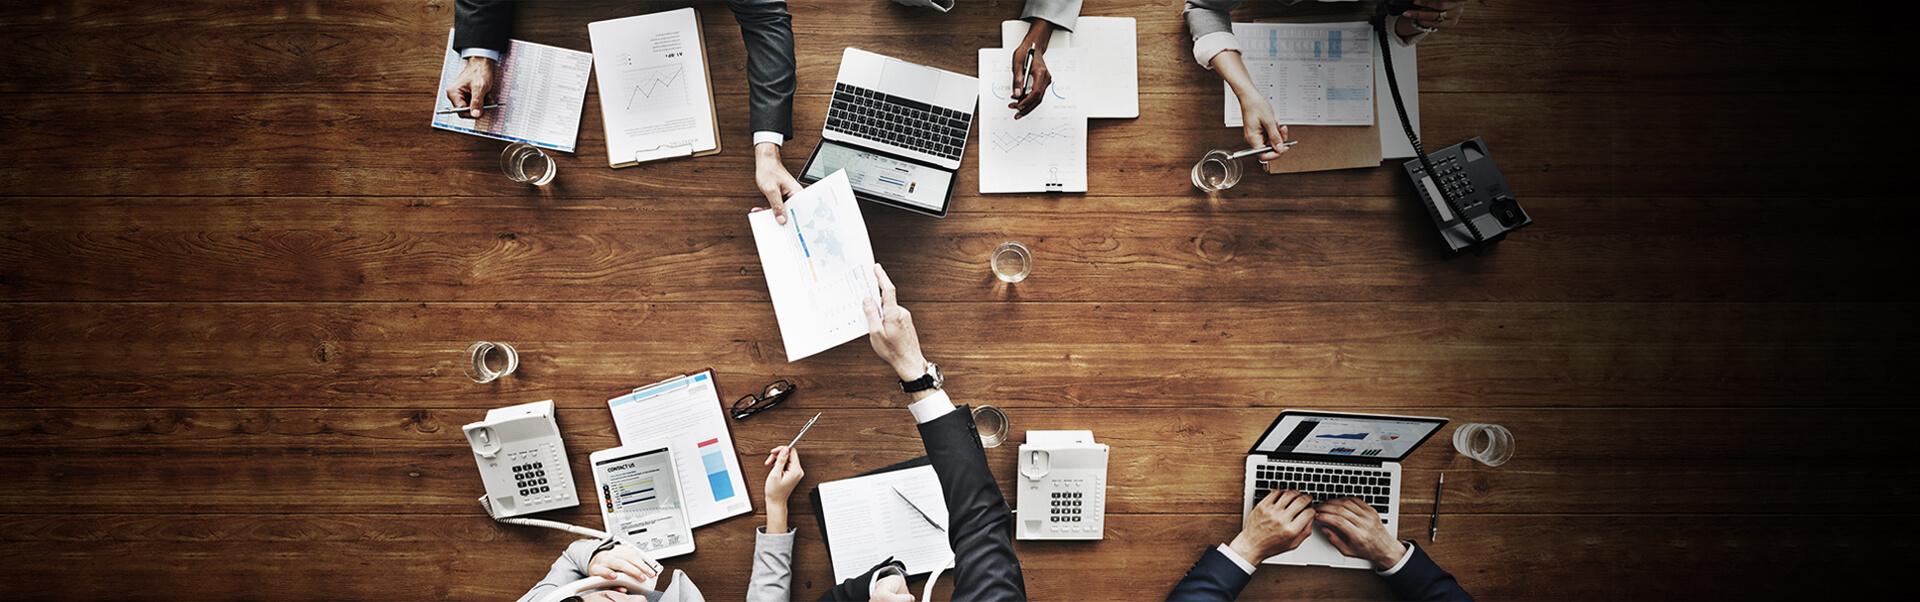 PCM Σύμβουλοι Μεθόδων & Διαδικασιών ΕΠΕ